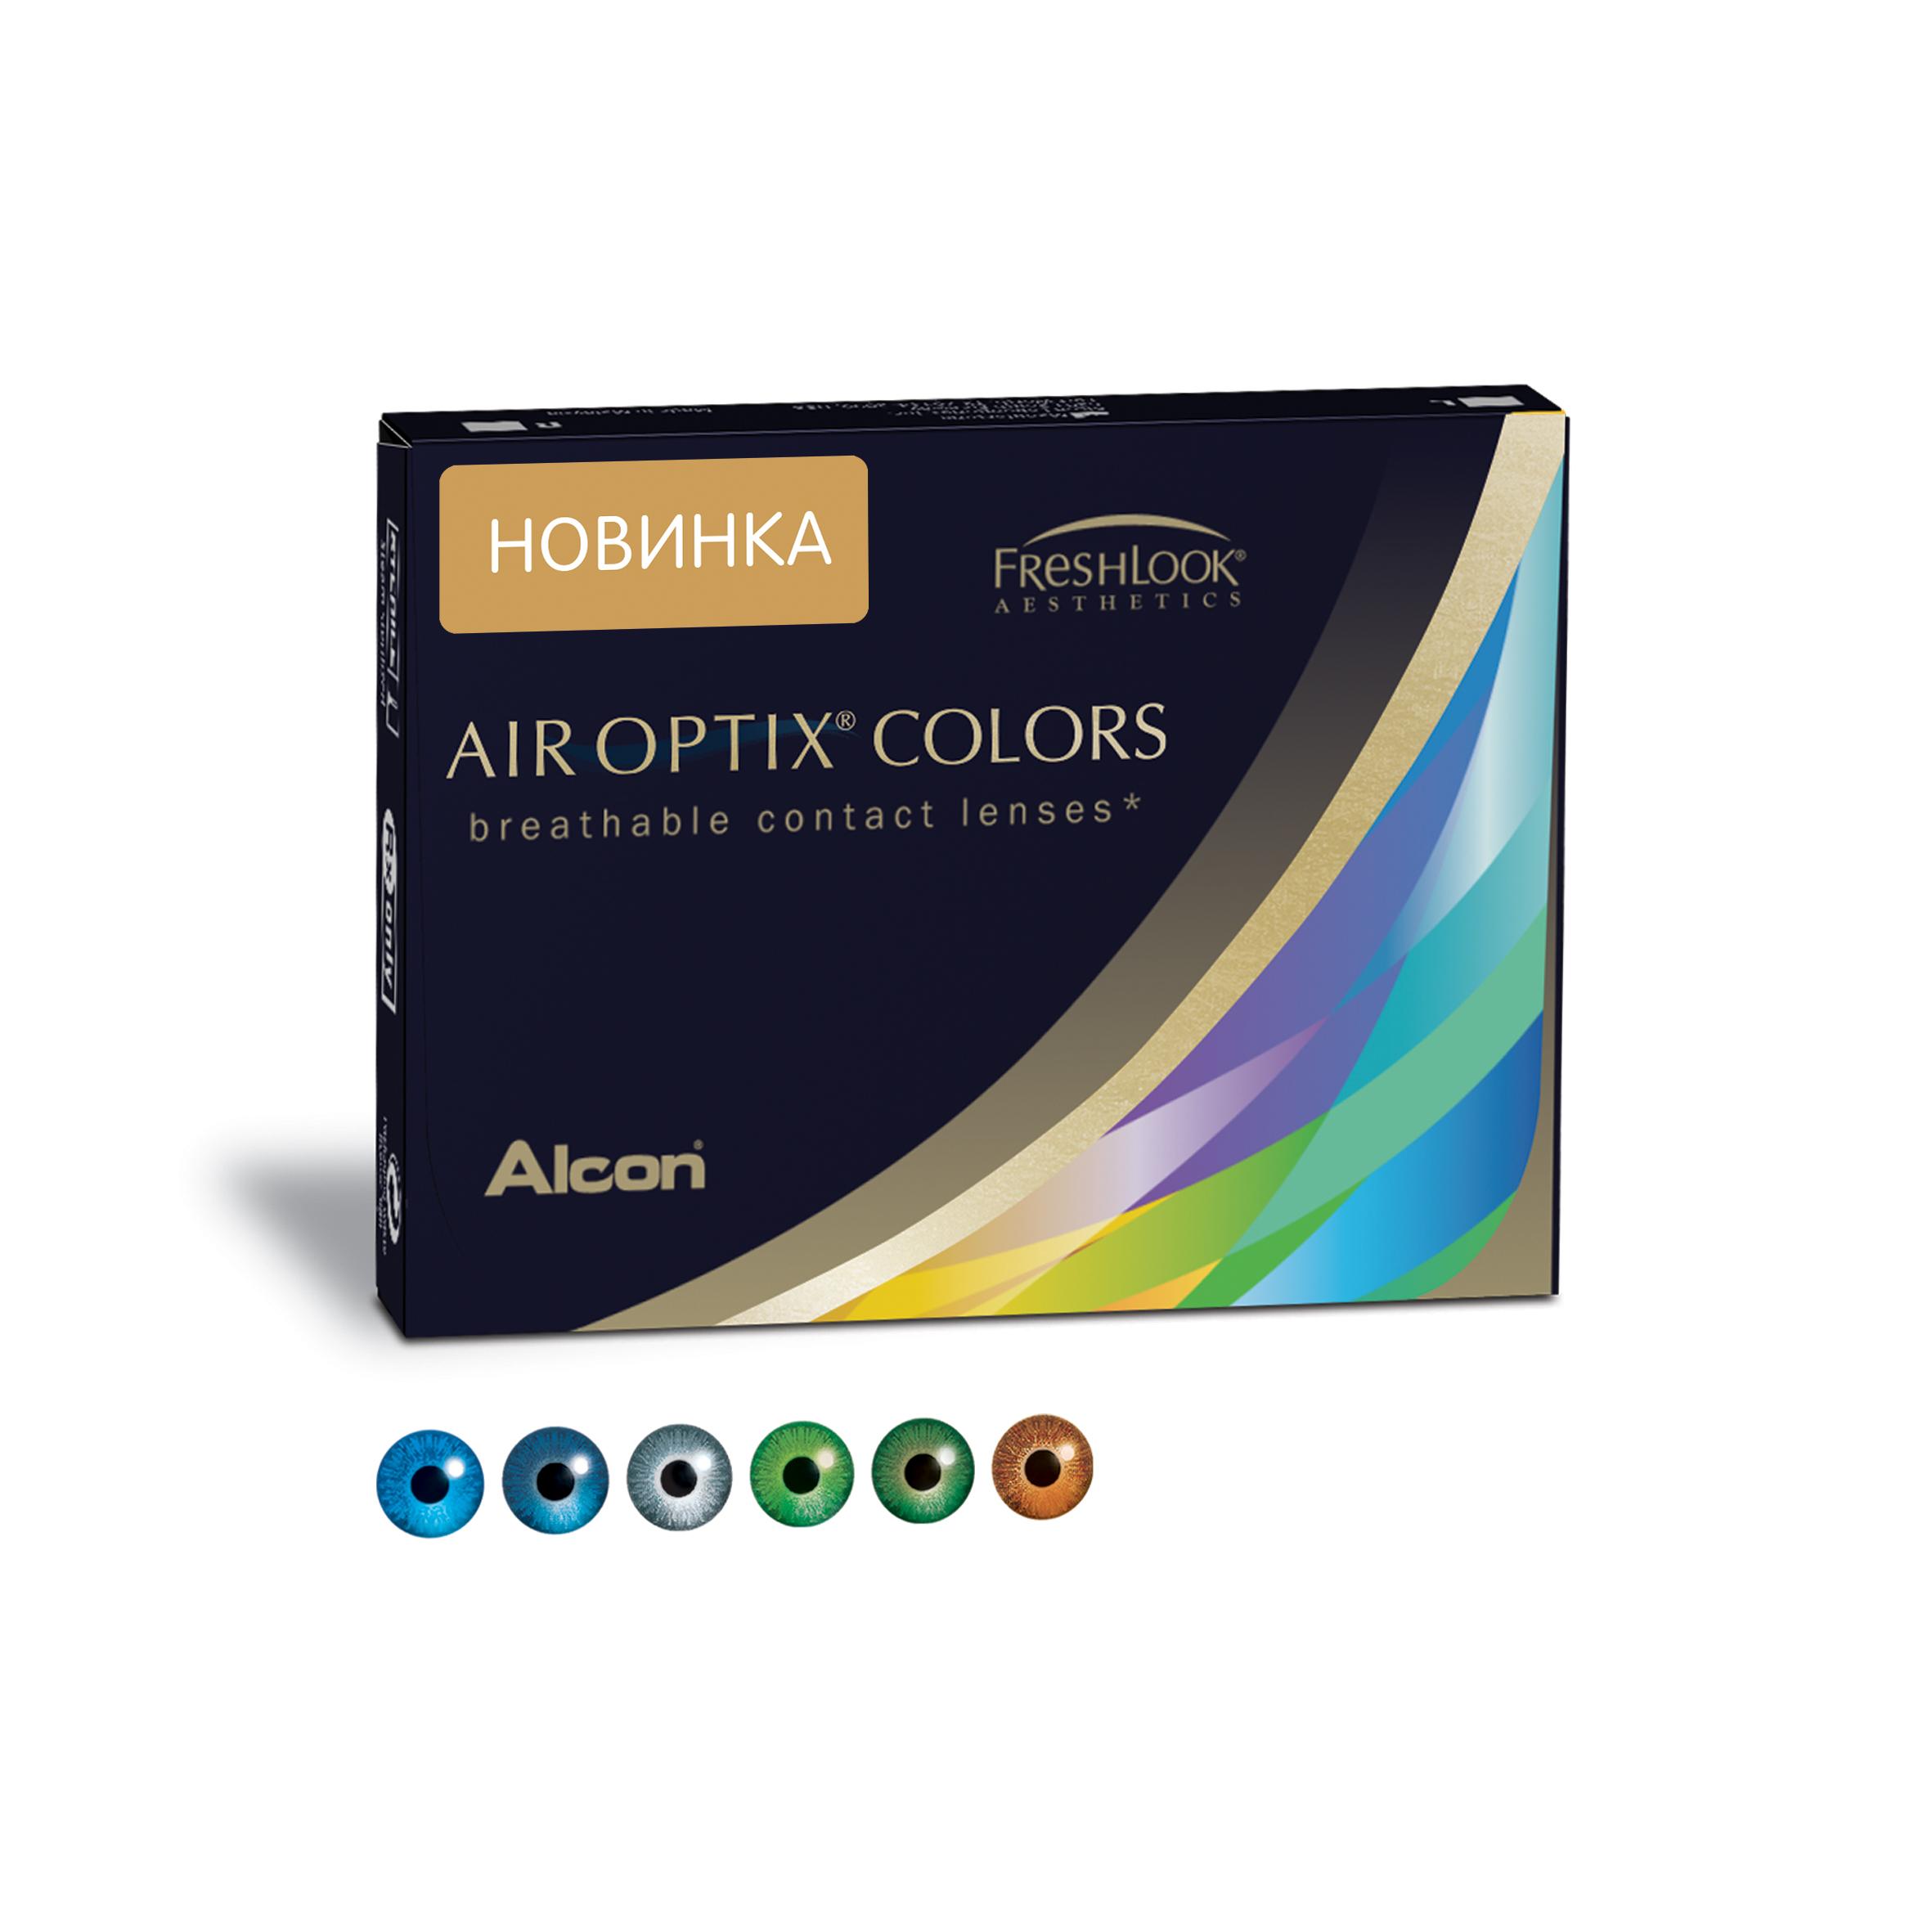 Аlcon контактные линзы Air Optix Colors 2 шт -1.00 Gemstone Green ( 31746124 )